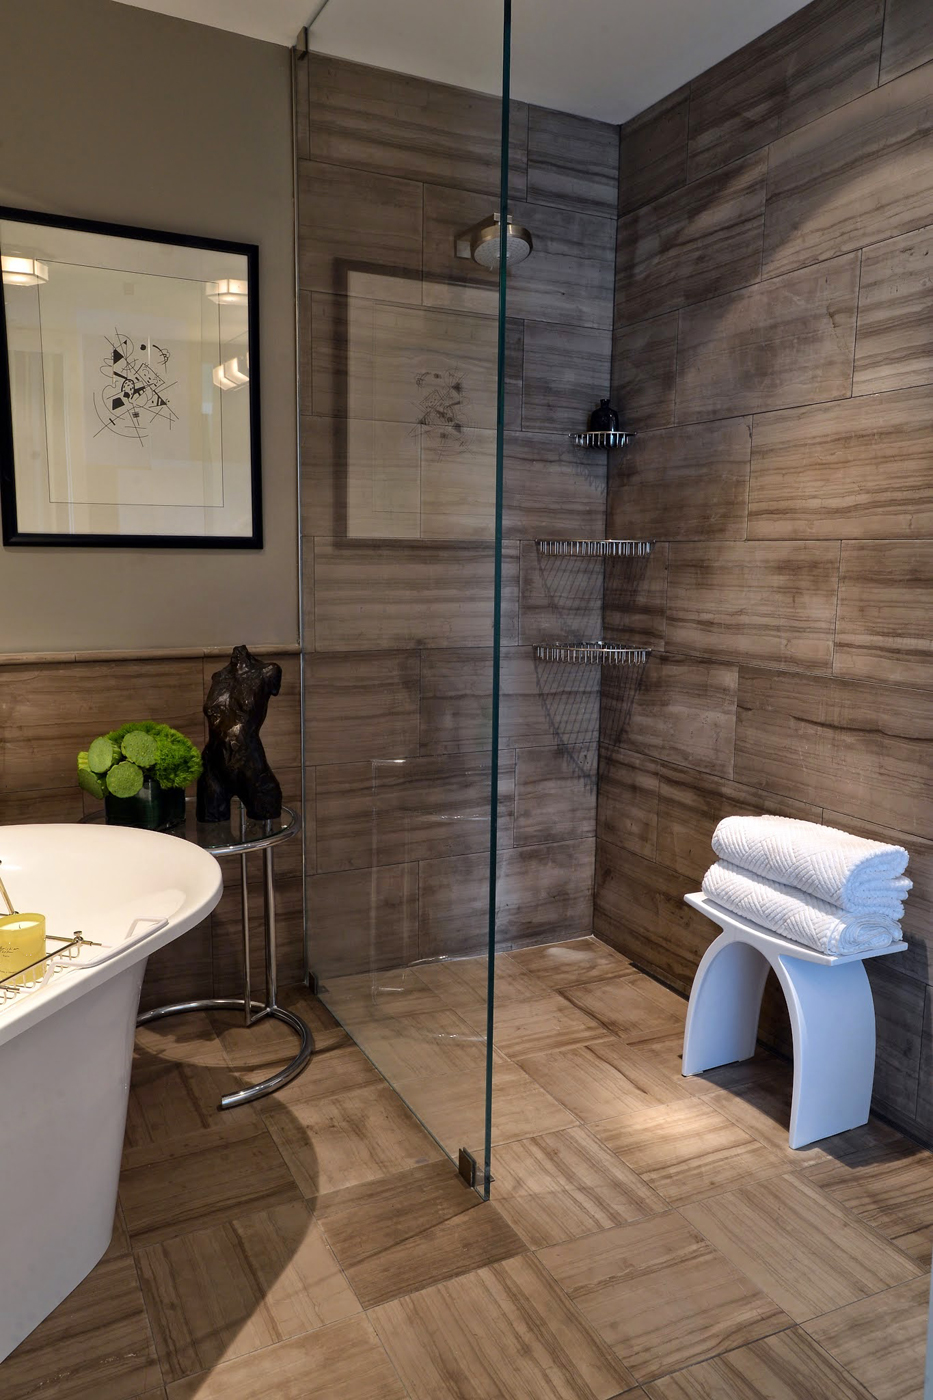 Sleek modern master bathroom glass shower enclosure with brown honed marble tiles in strie pattern | Savage Interior Design